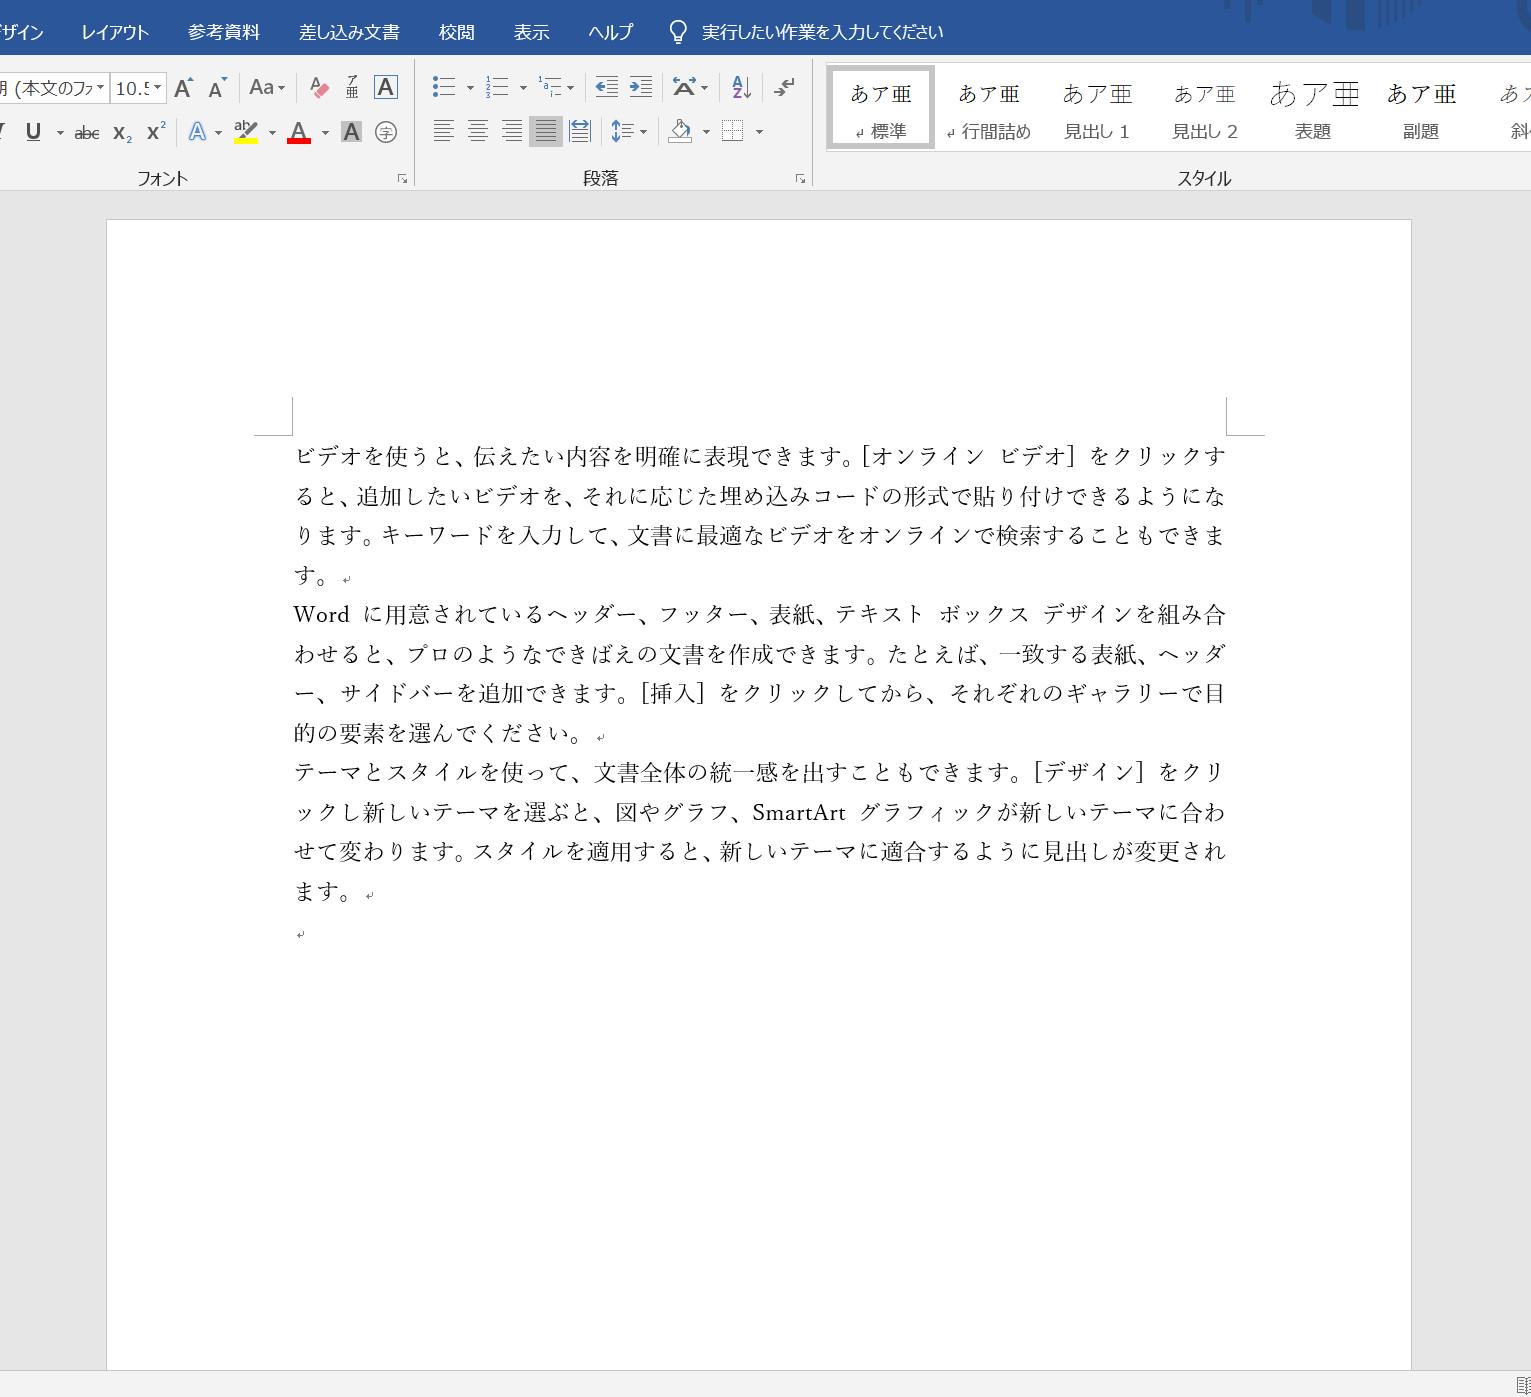 f:id:shunsuke2000:20190612231235p:plain